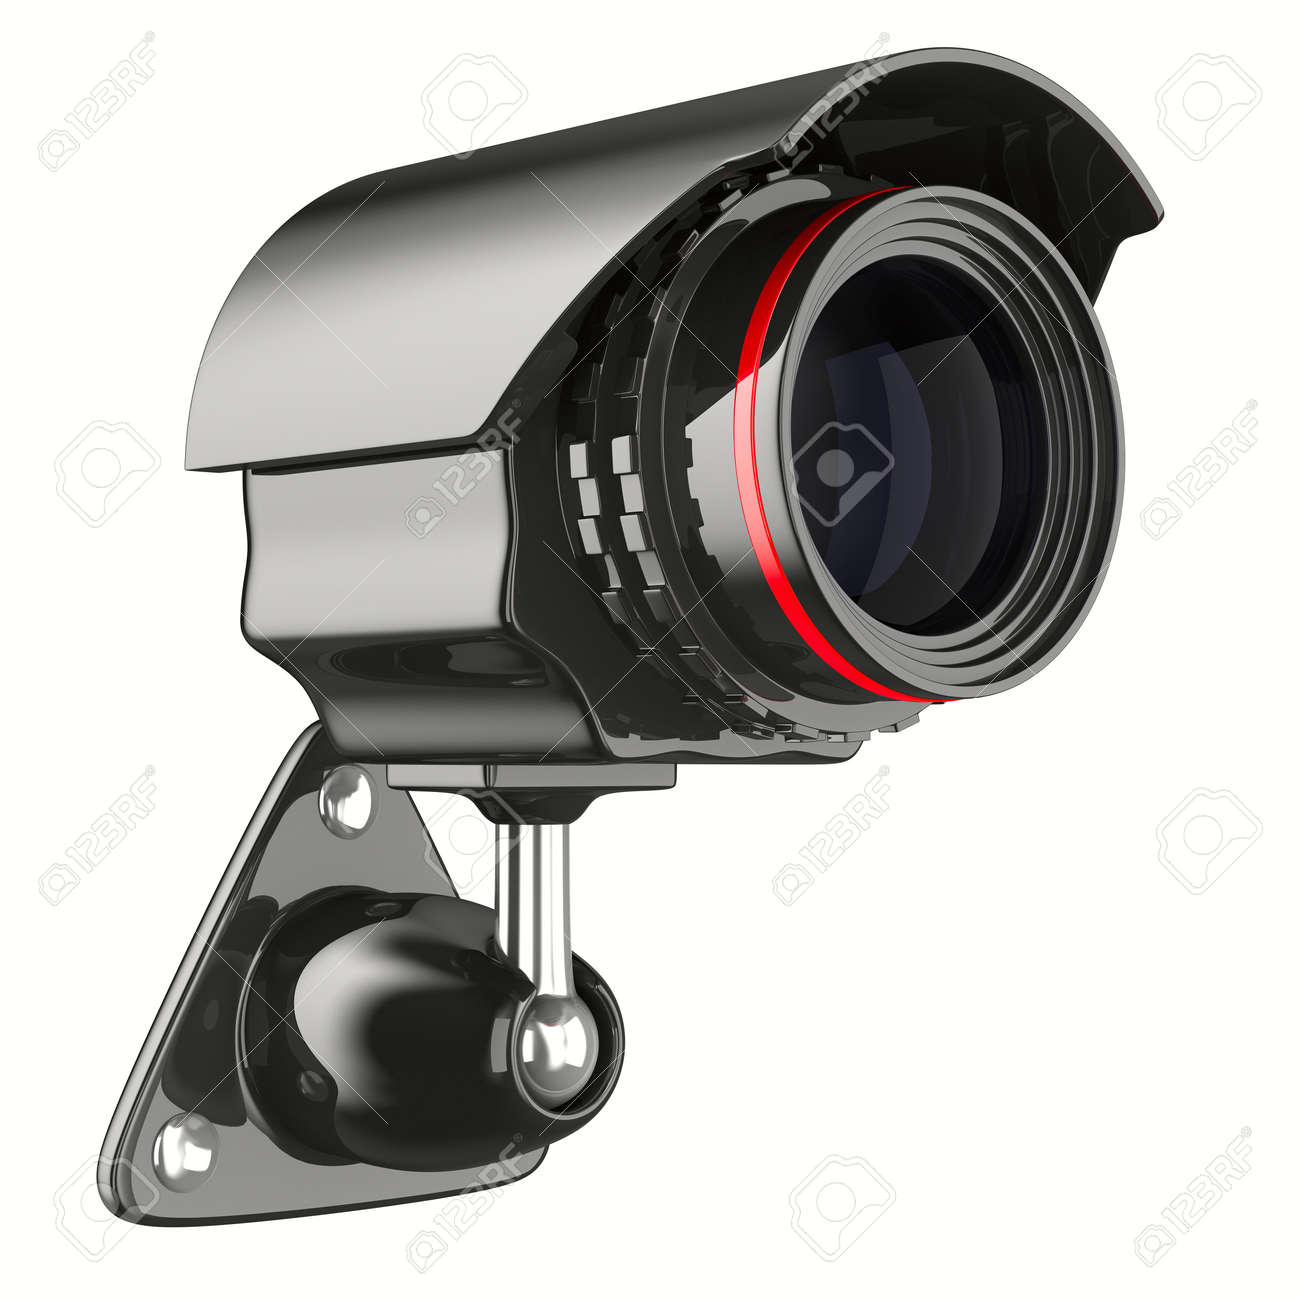 security camera on white background. Isolated 3D image Stock Photo - 9250010